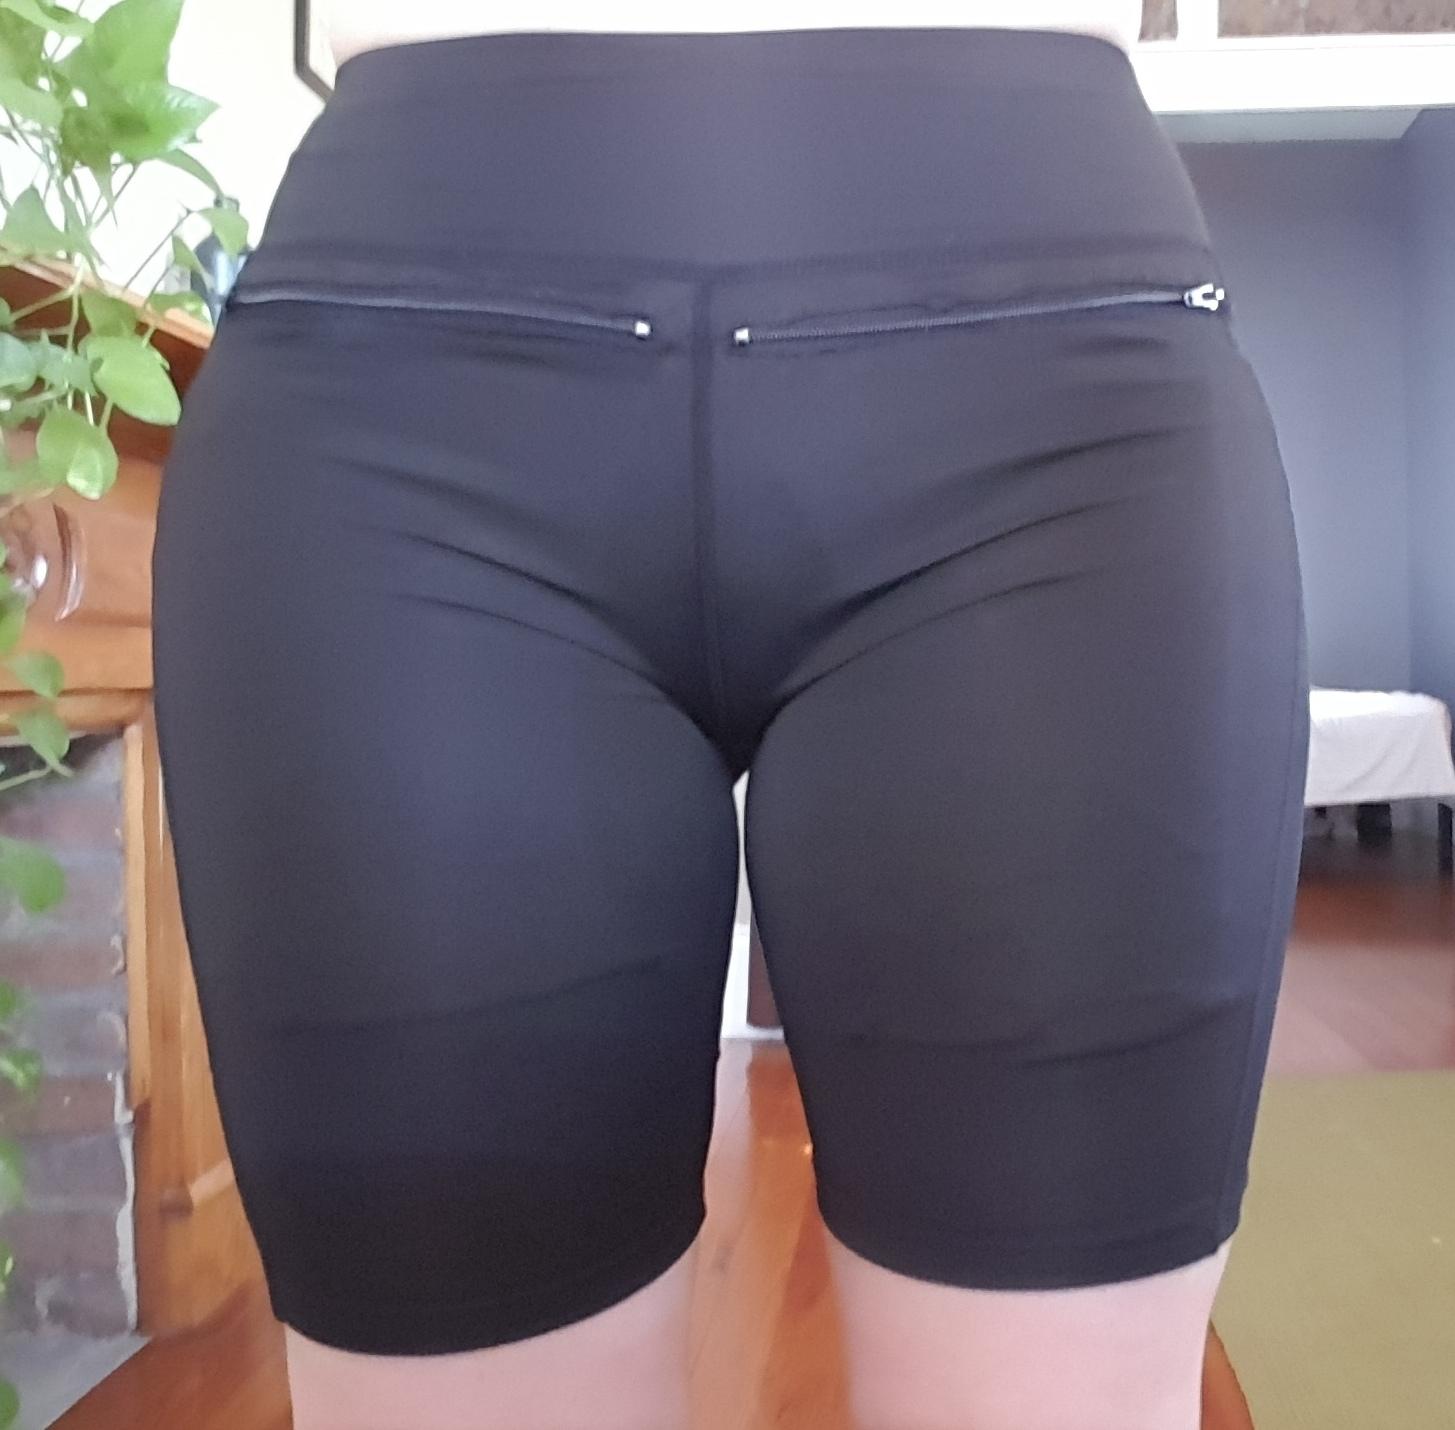 Ladies Zipper Pocket Underpants